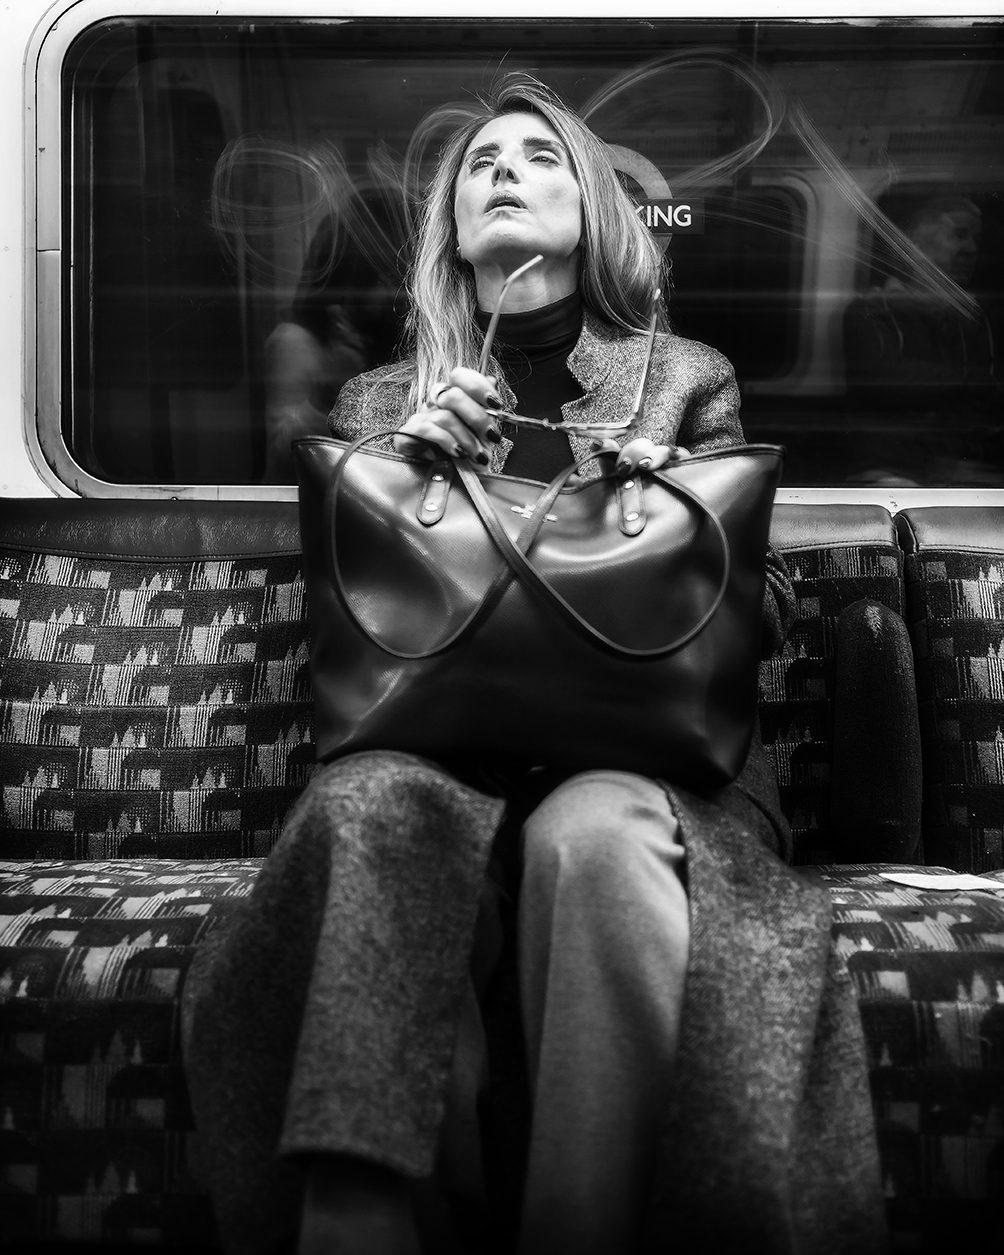 Woman in London Tube